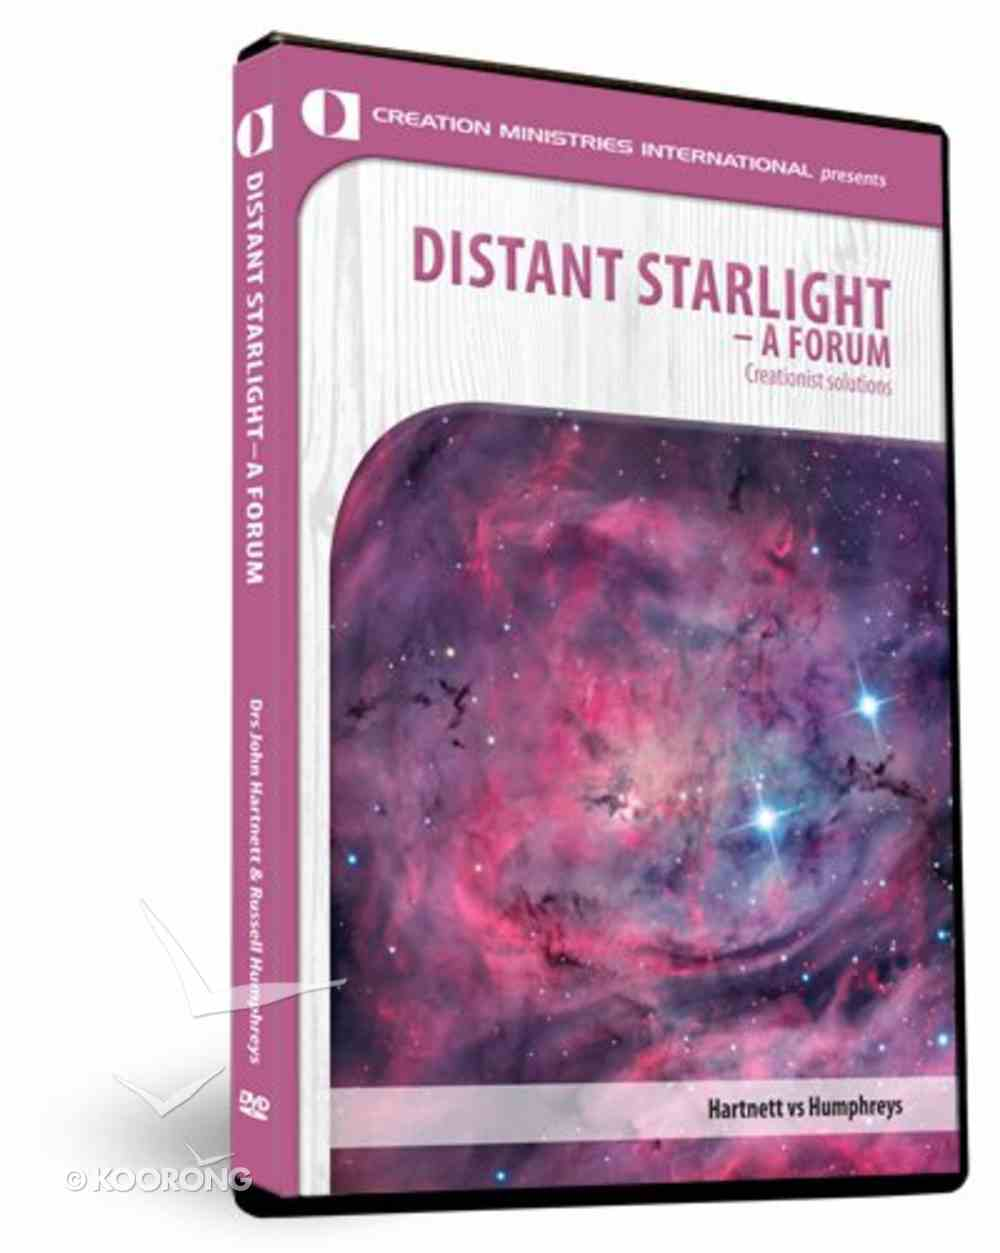 Distant Starlight - a Forum (2010 Usa Supercamp Series) DVD